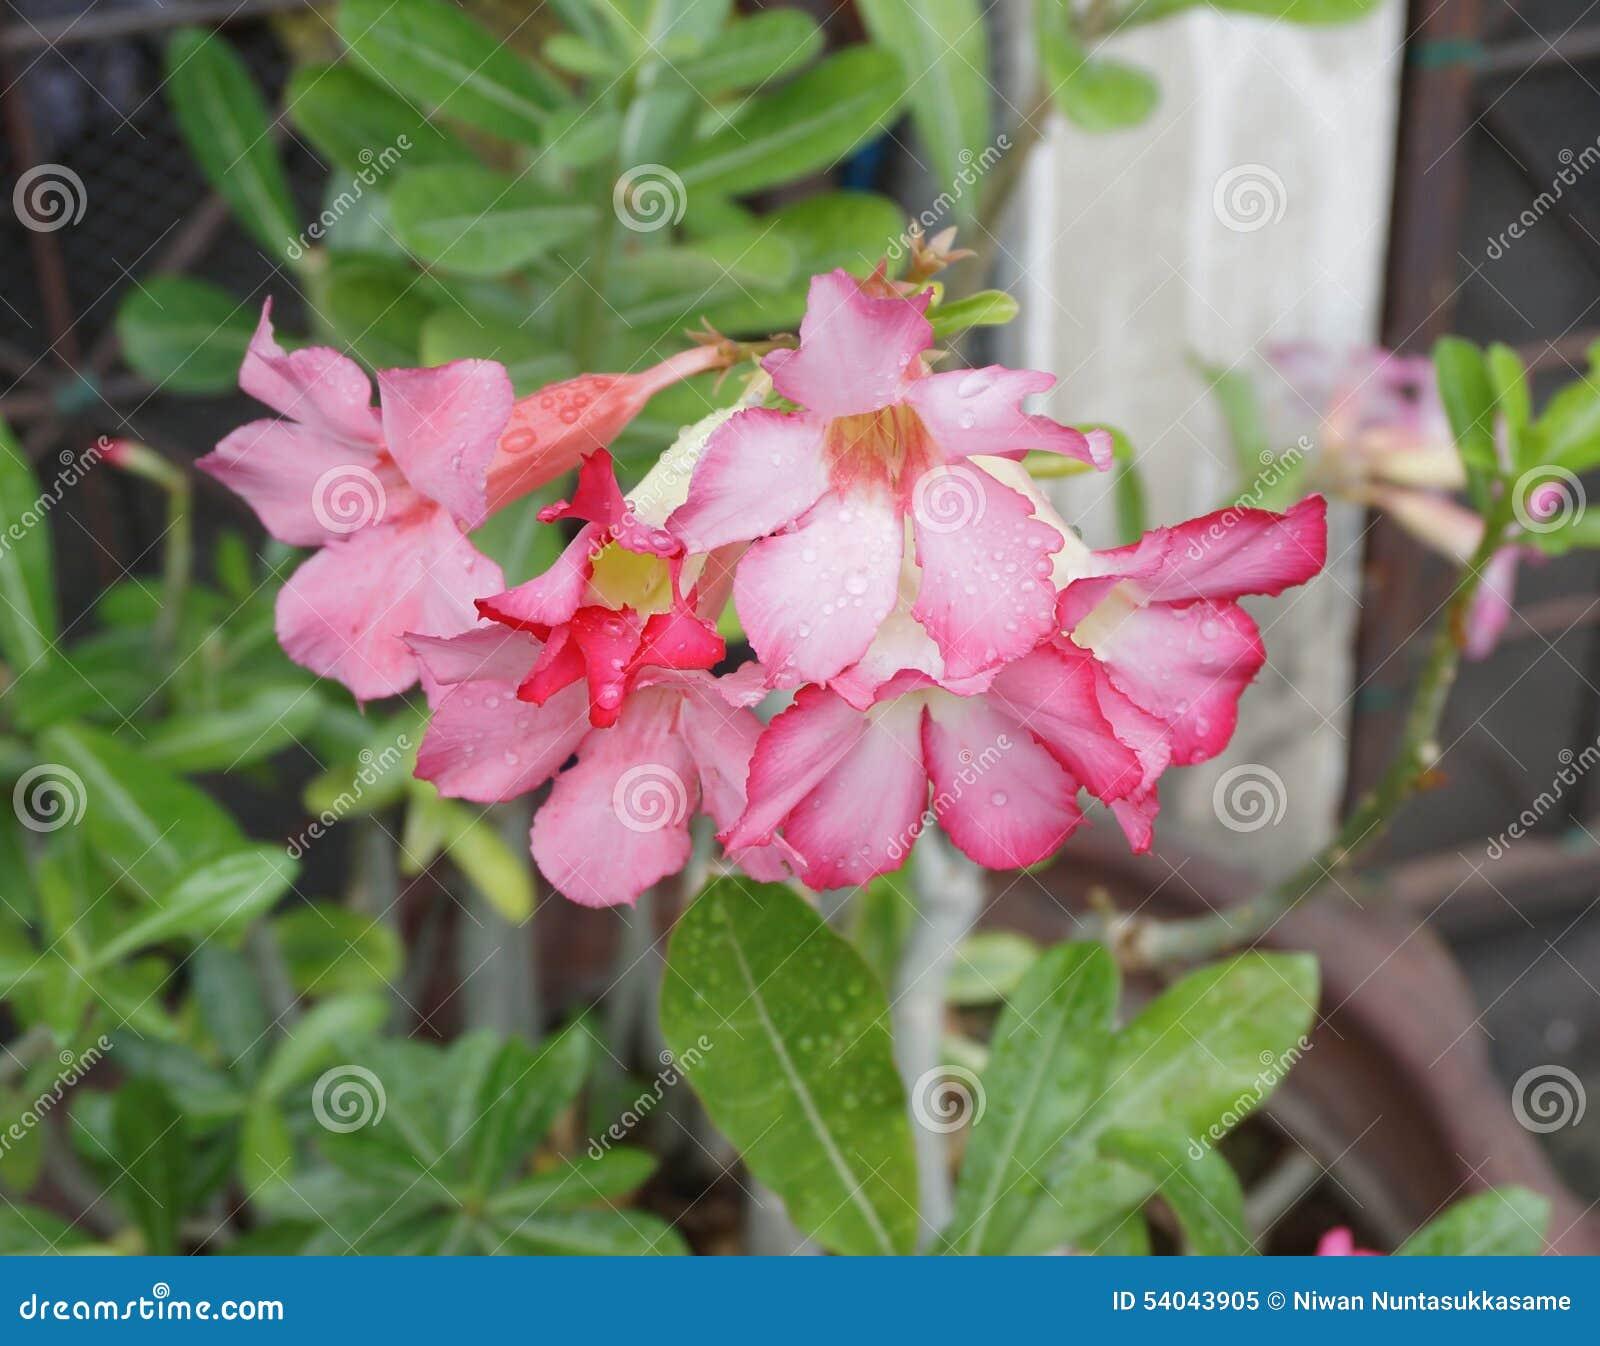 Pink desert flower adenium obesum stock image image of floral download pink desert flower adenium obesum stock image image of floral biology mightylinksfo